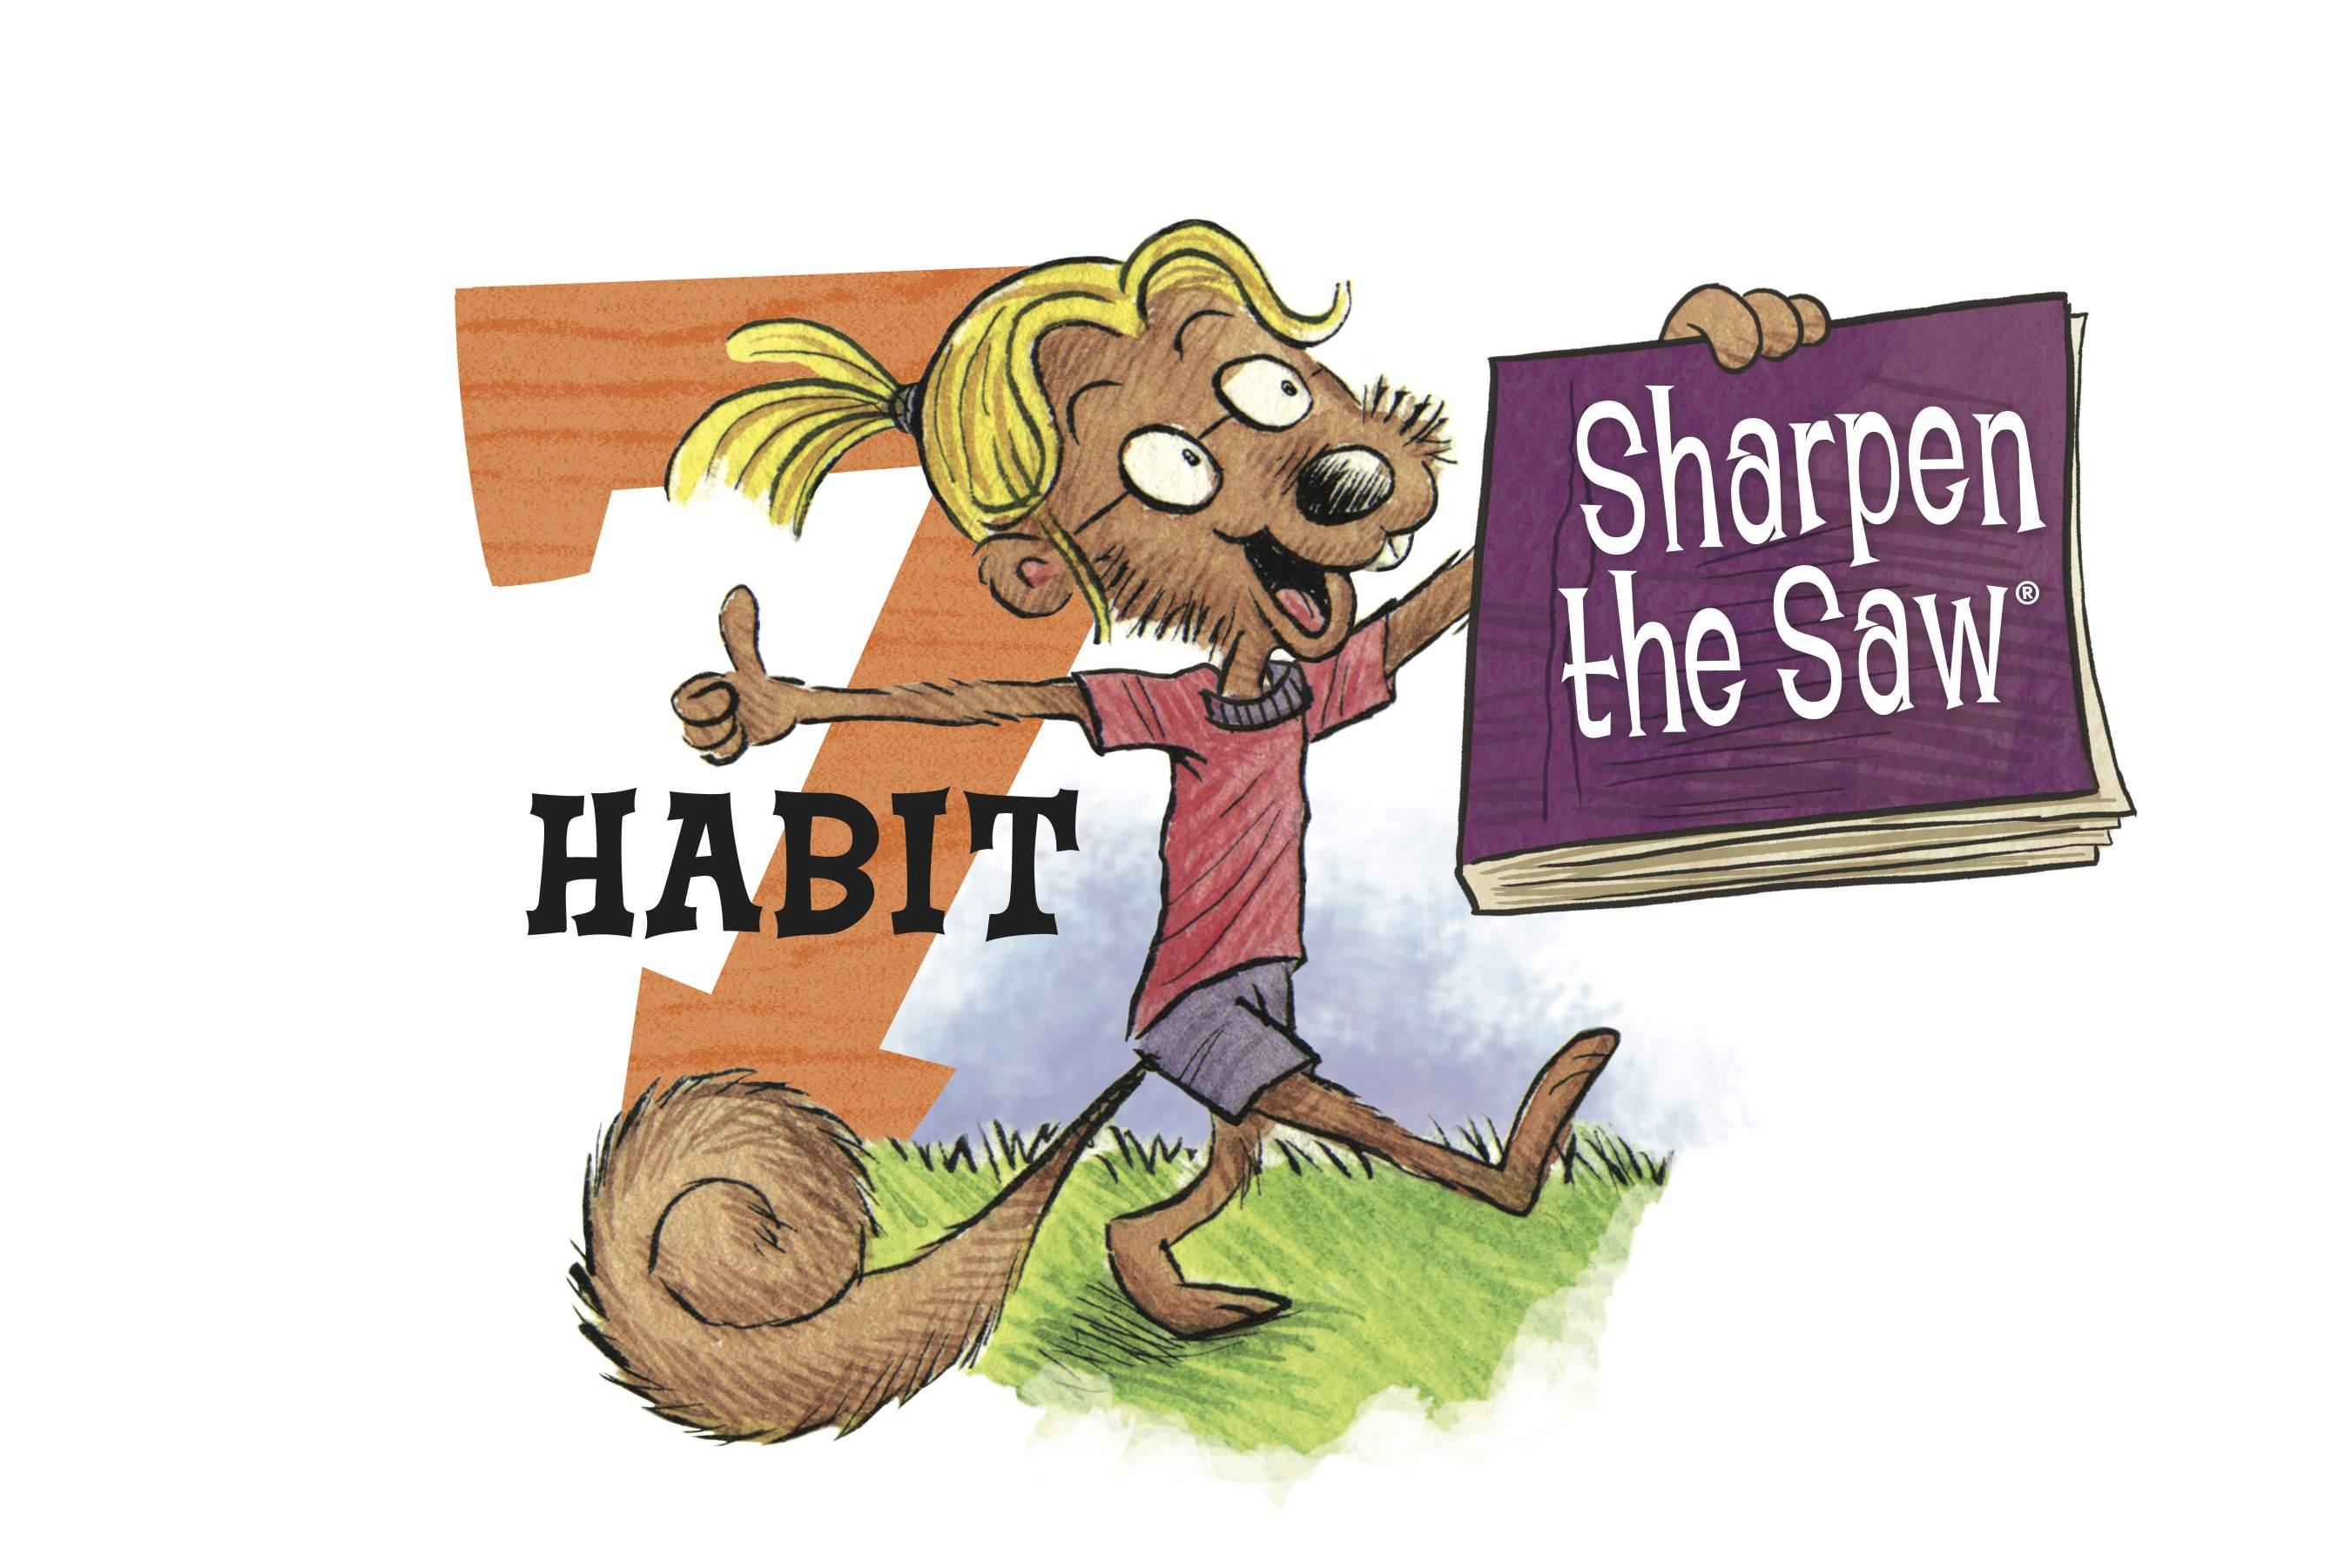 Preparatory Academy   The Seven Habits  Habit 7 Sharpen The Saw